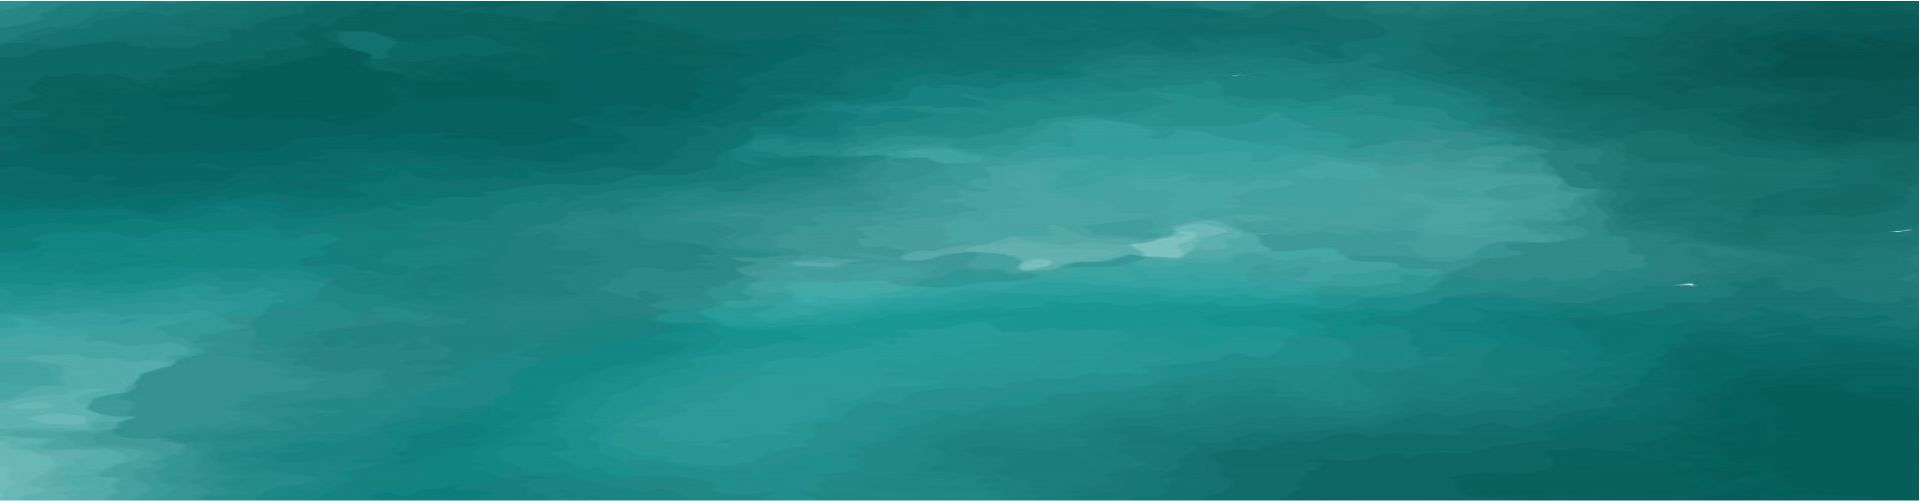 dark-green-watercolor-background